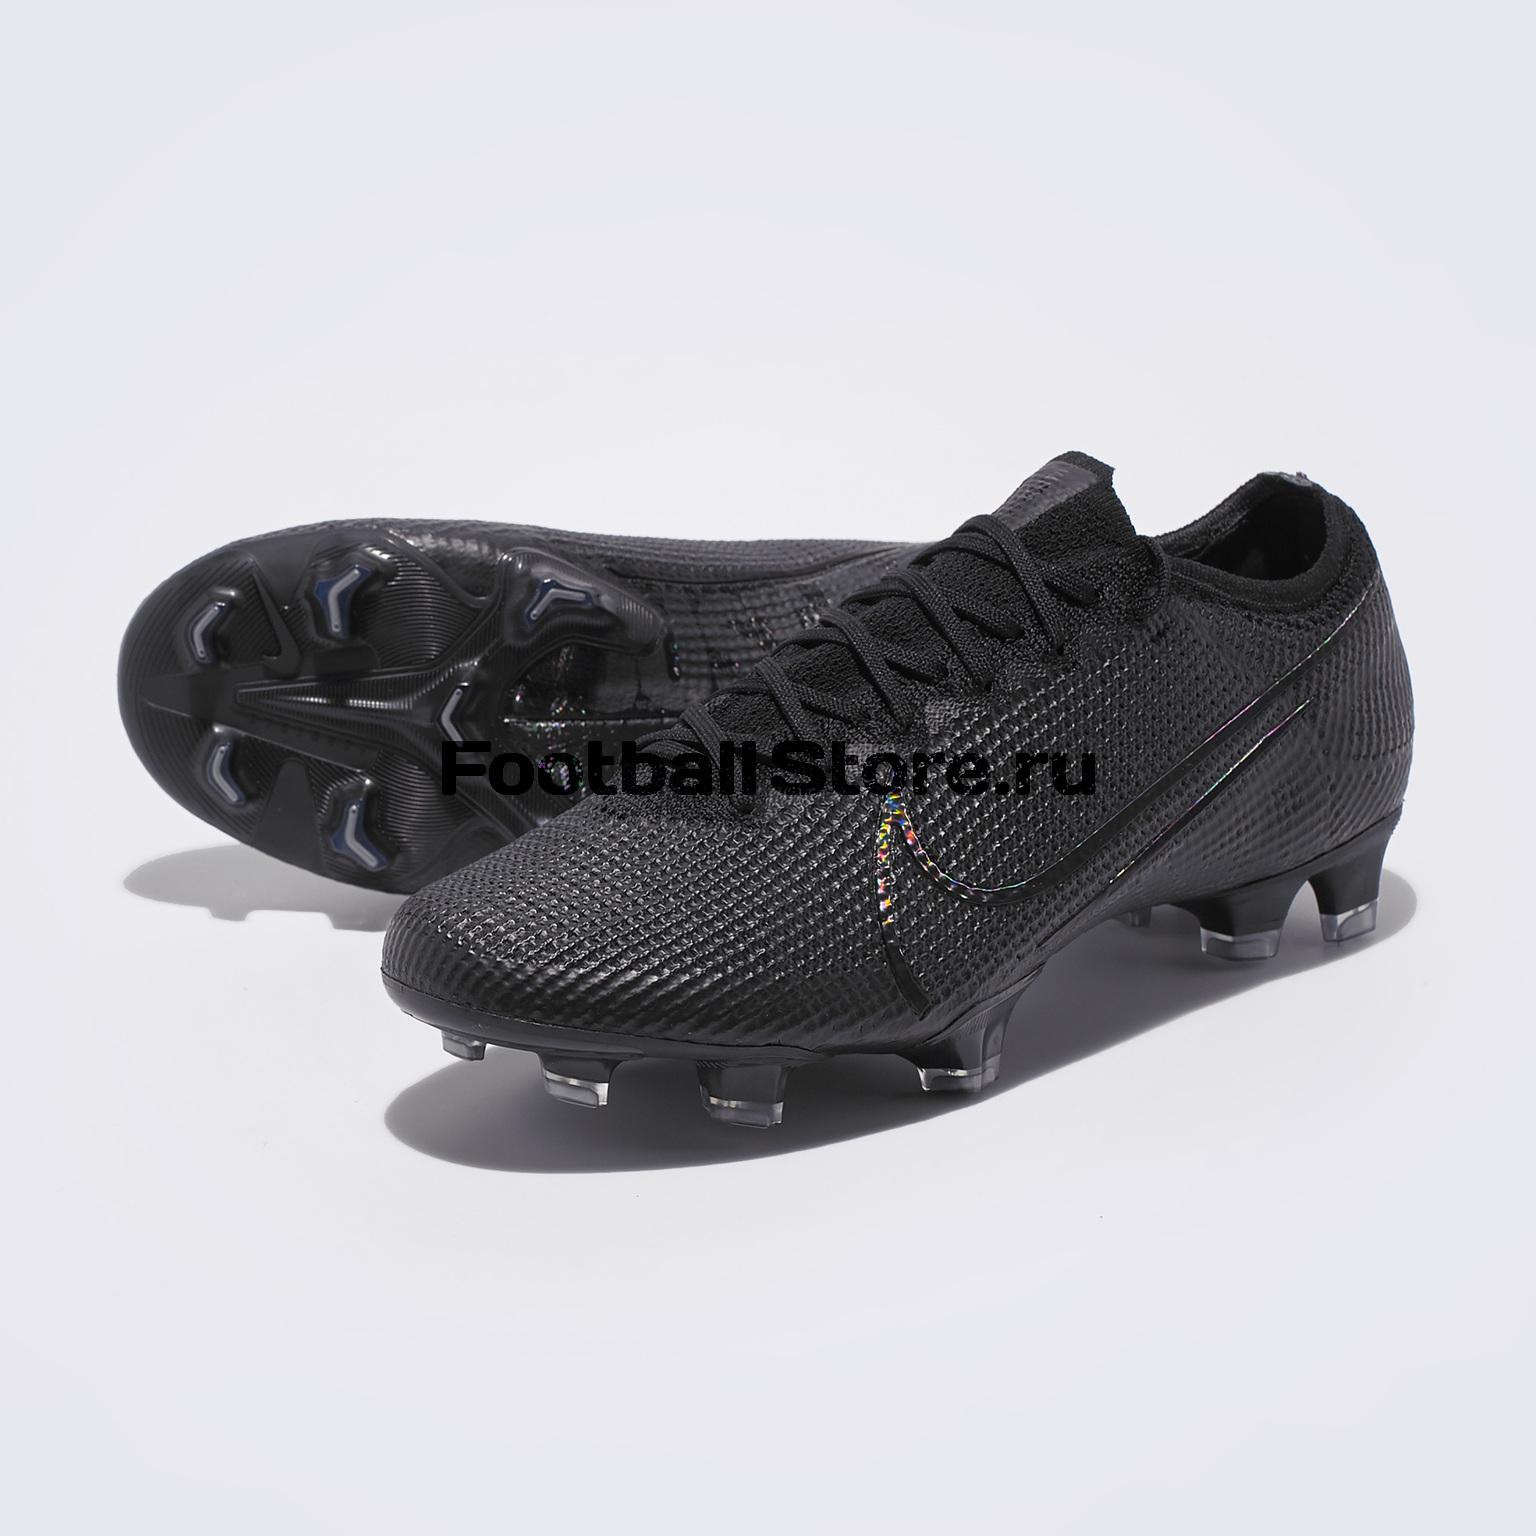 Бутсы Nike Vapor 13 Elite FG AQ4176-001 бутсы nike mercurial vapor xi neymar fg 921547 407